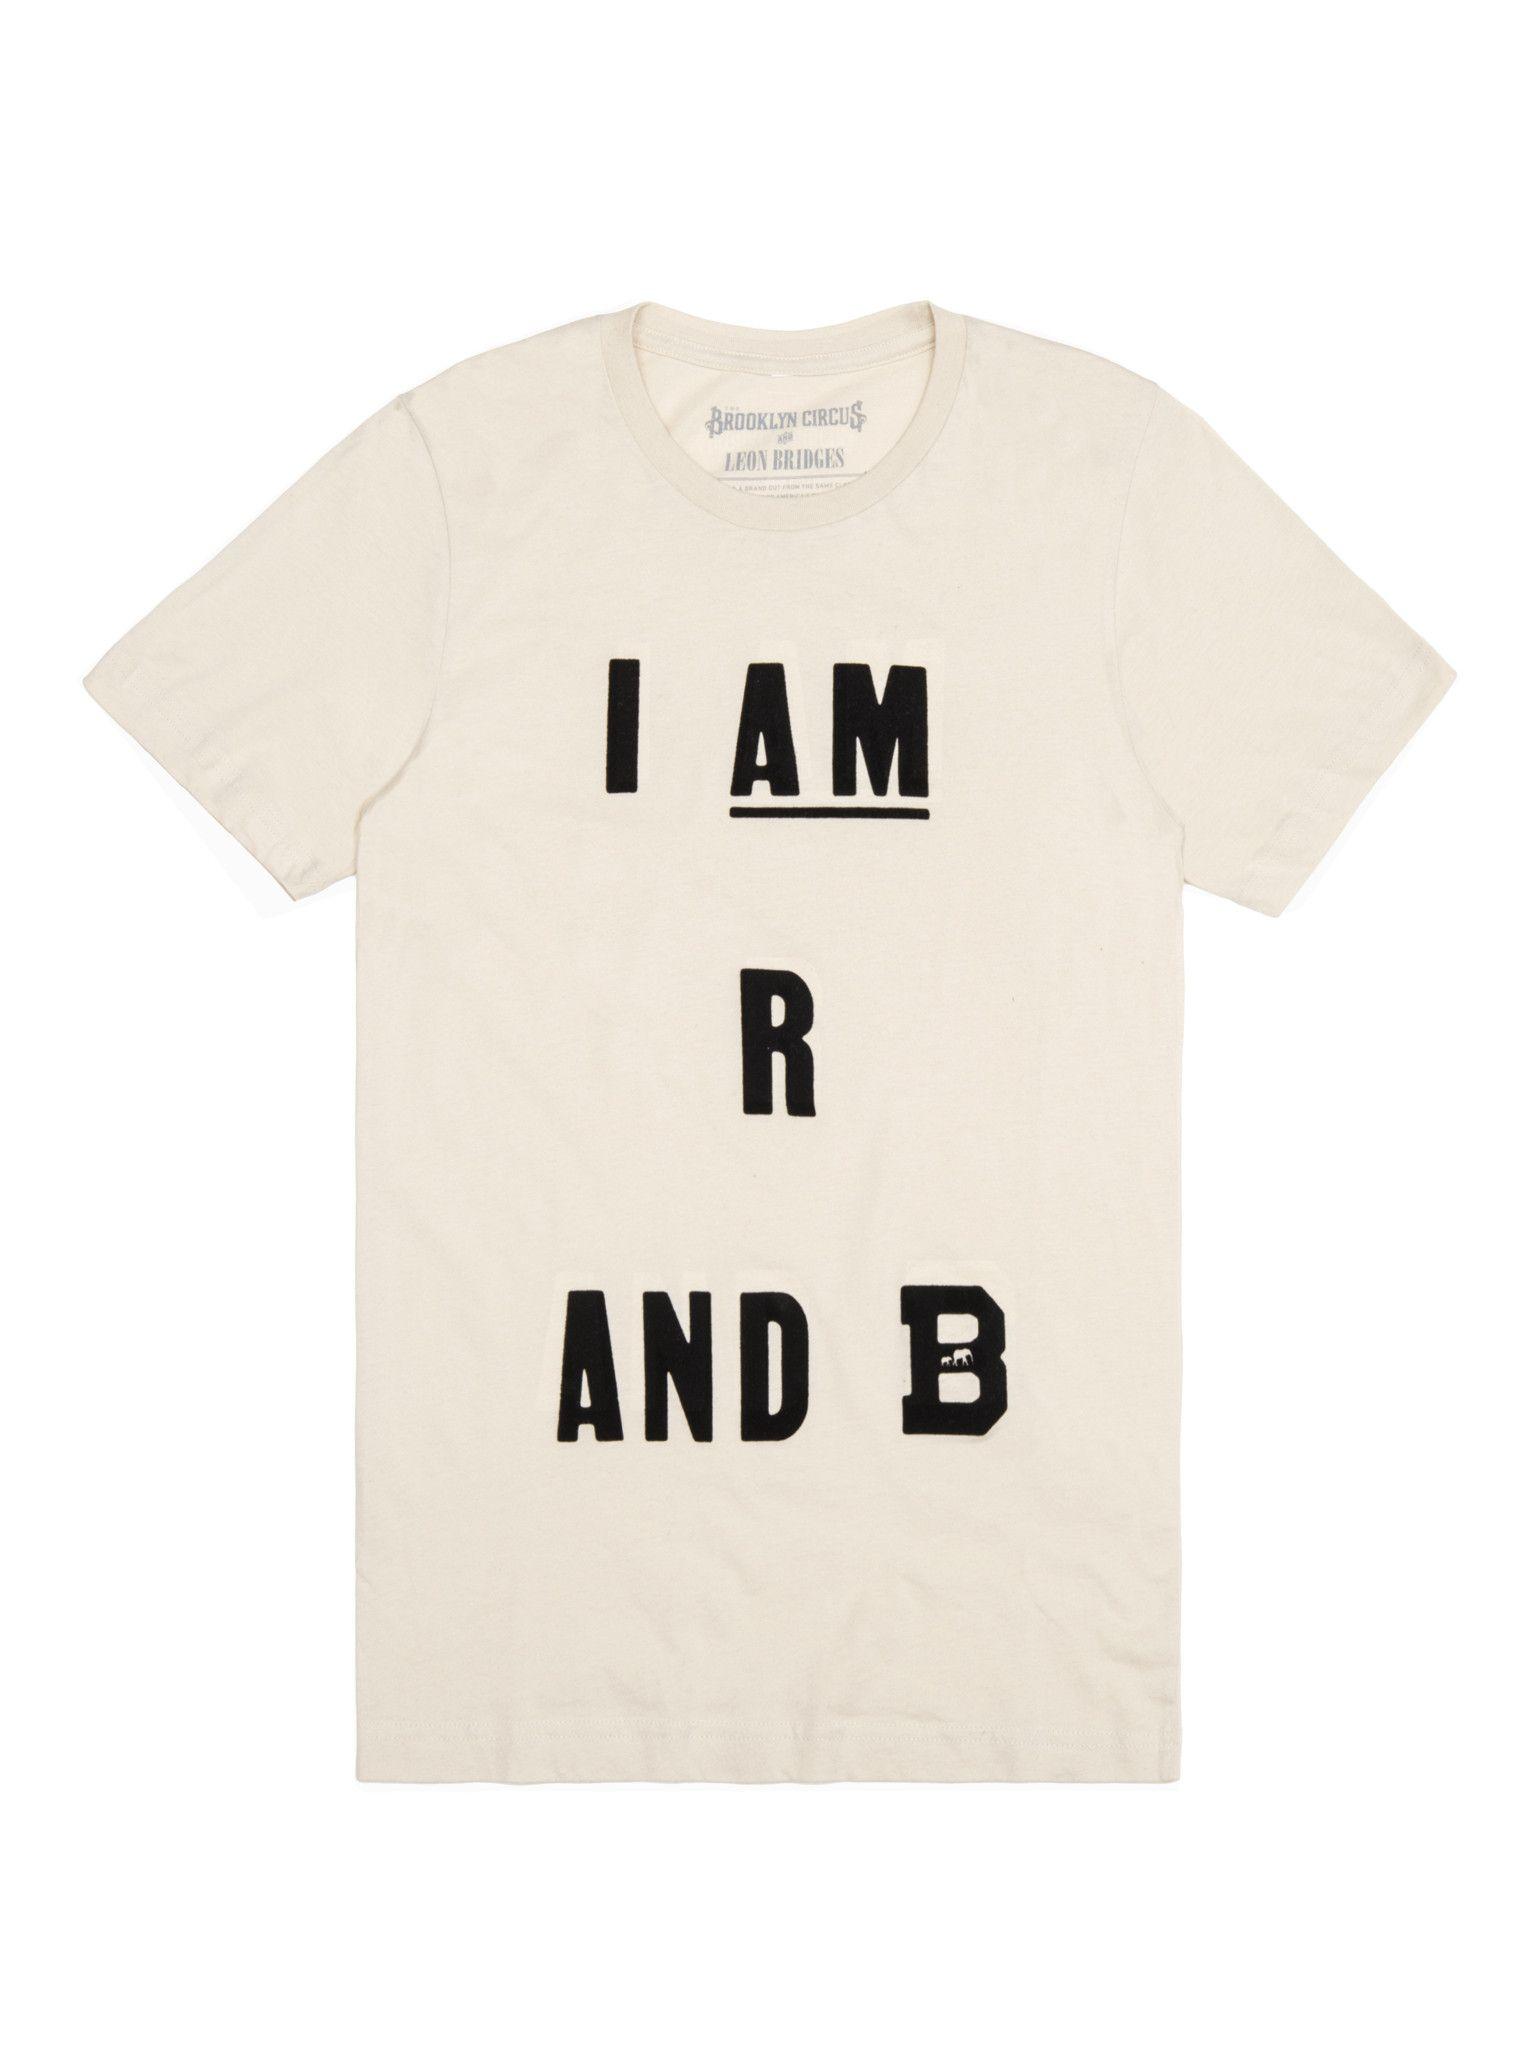 Bkc Leon Bridges Tee Leon Bridges Tees Shirts